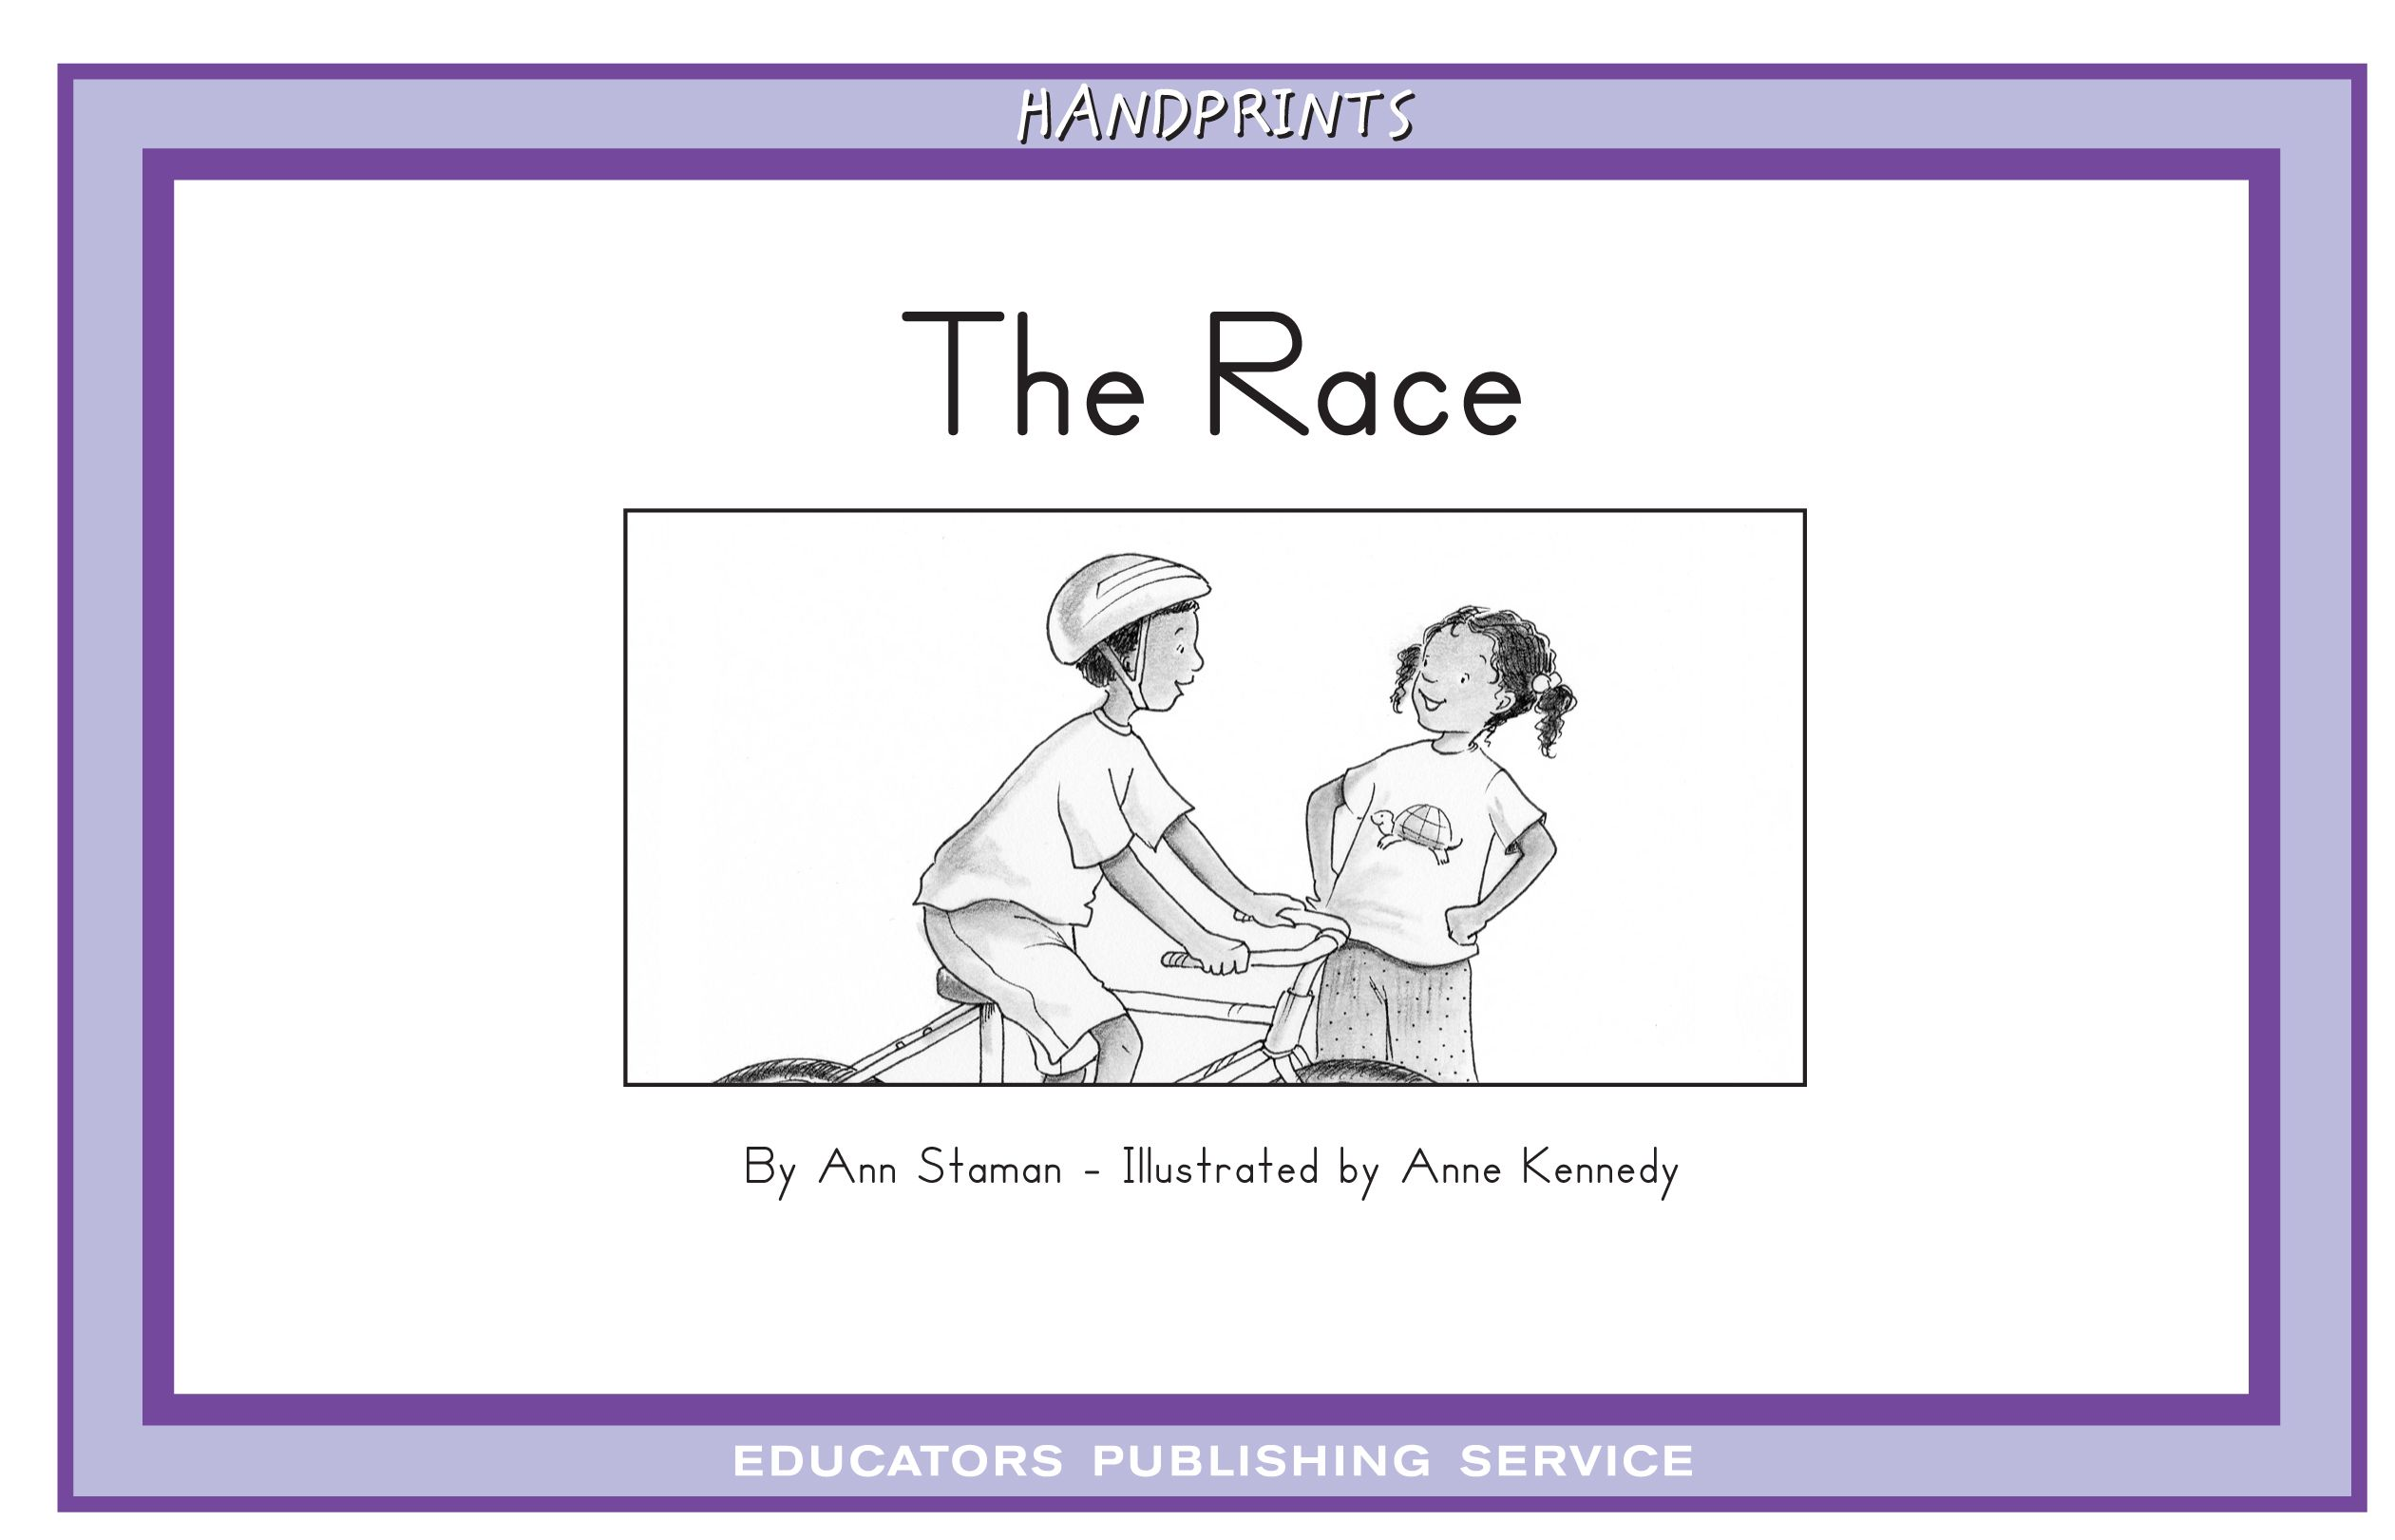 The Race Level 8 Handprints C Set 3 Leveled Readers